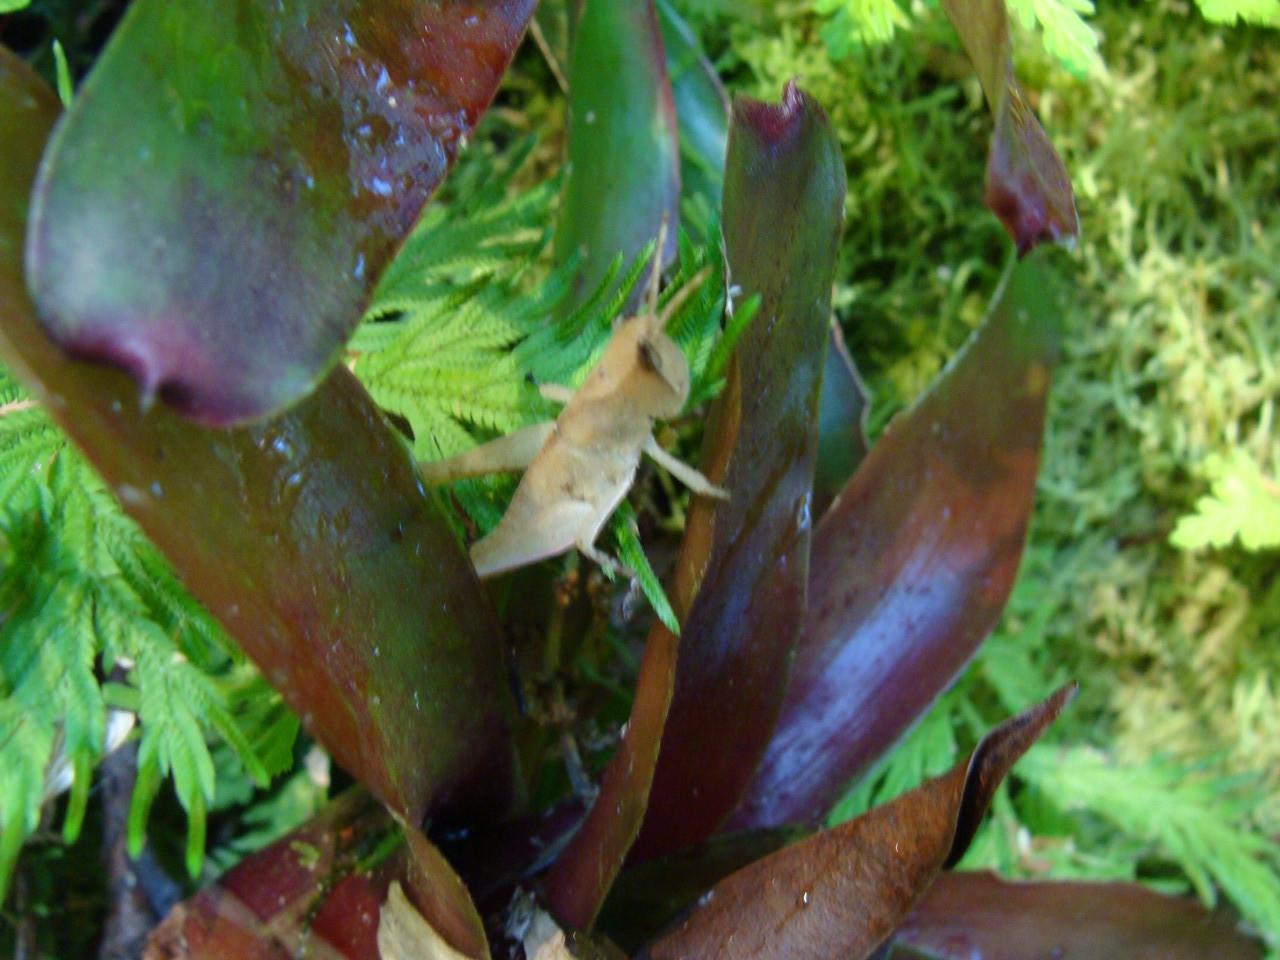 La micro biodiversidad